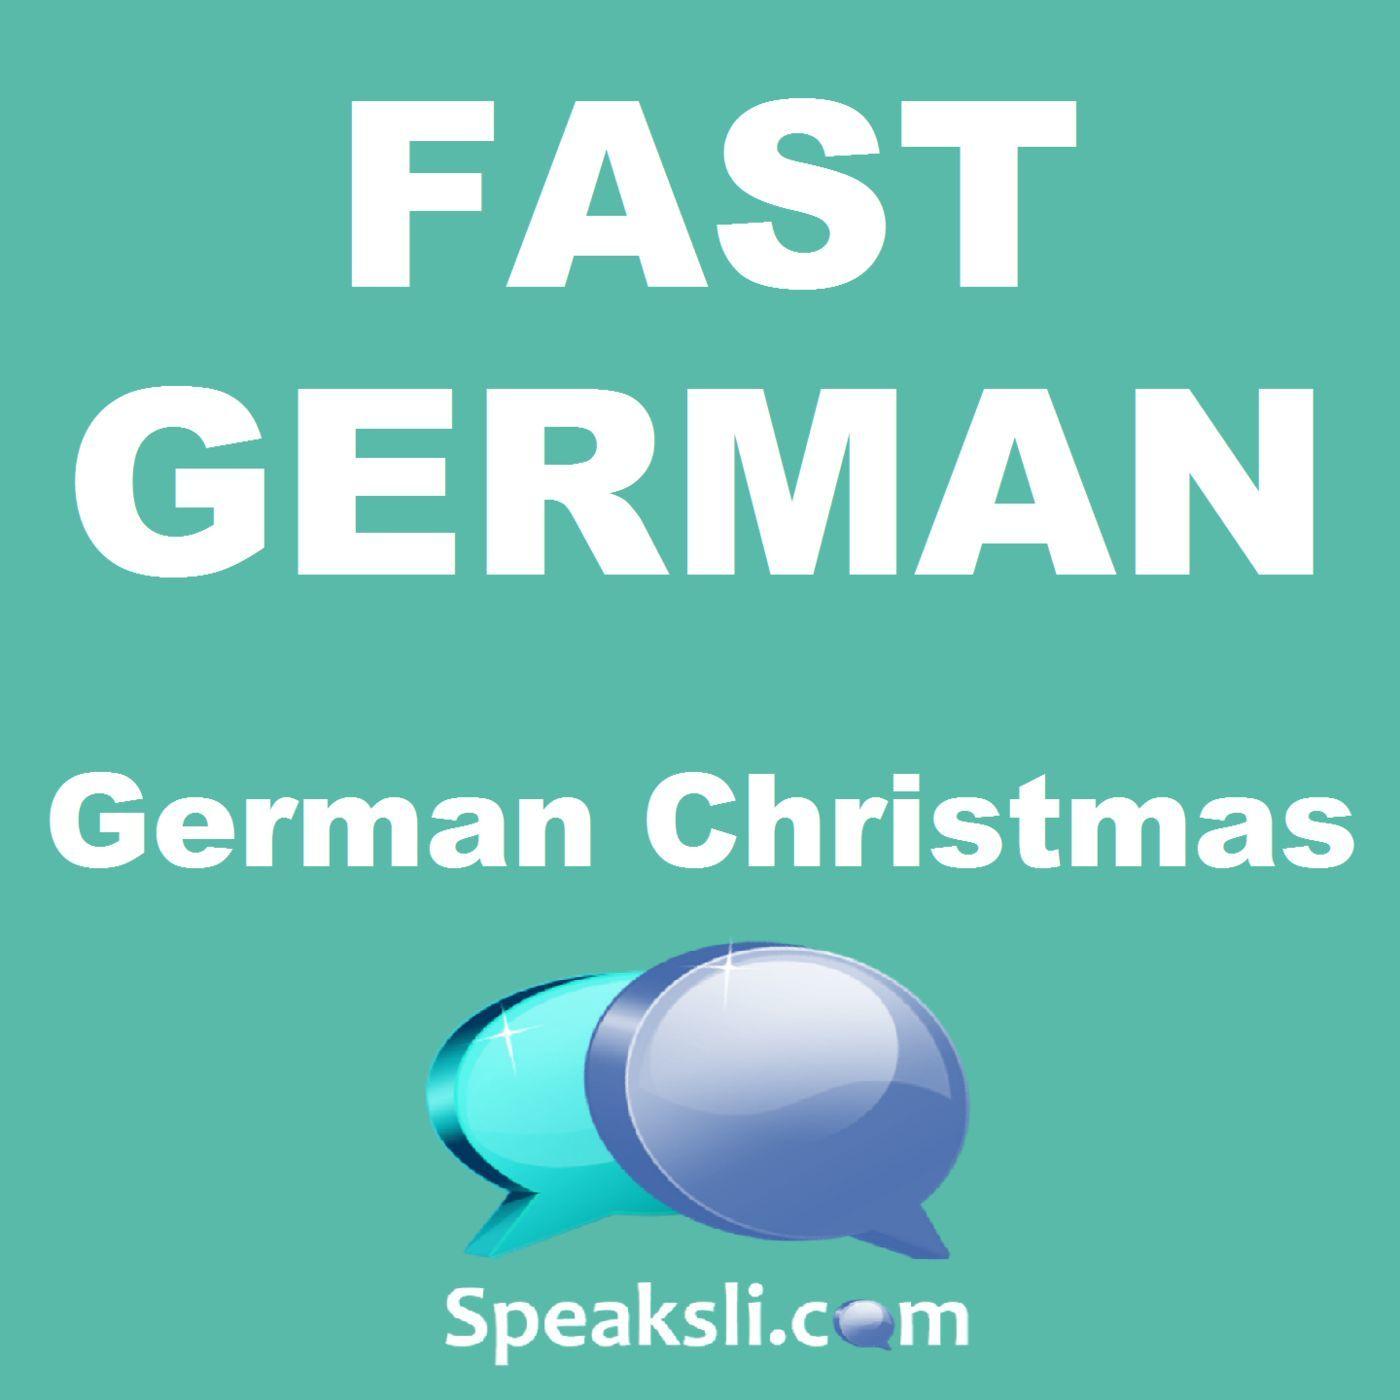 Ep. 33: German Christmas | Fast German | Speaksli.com